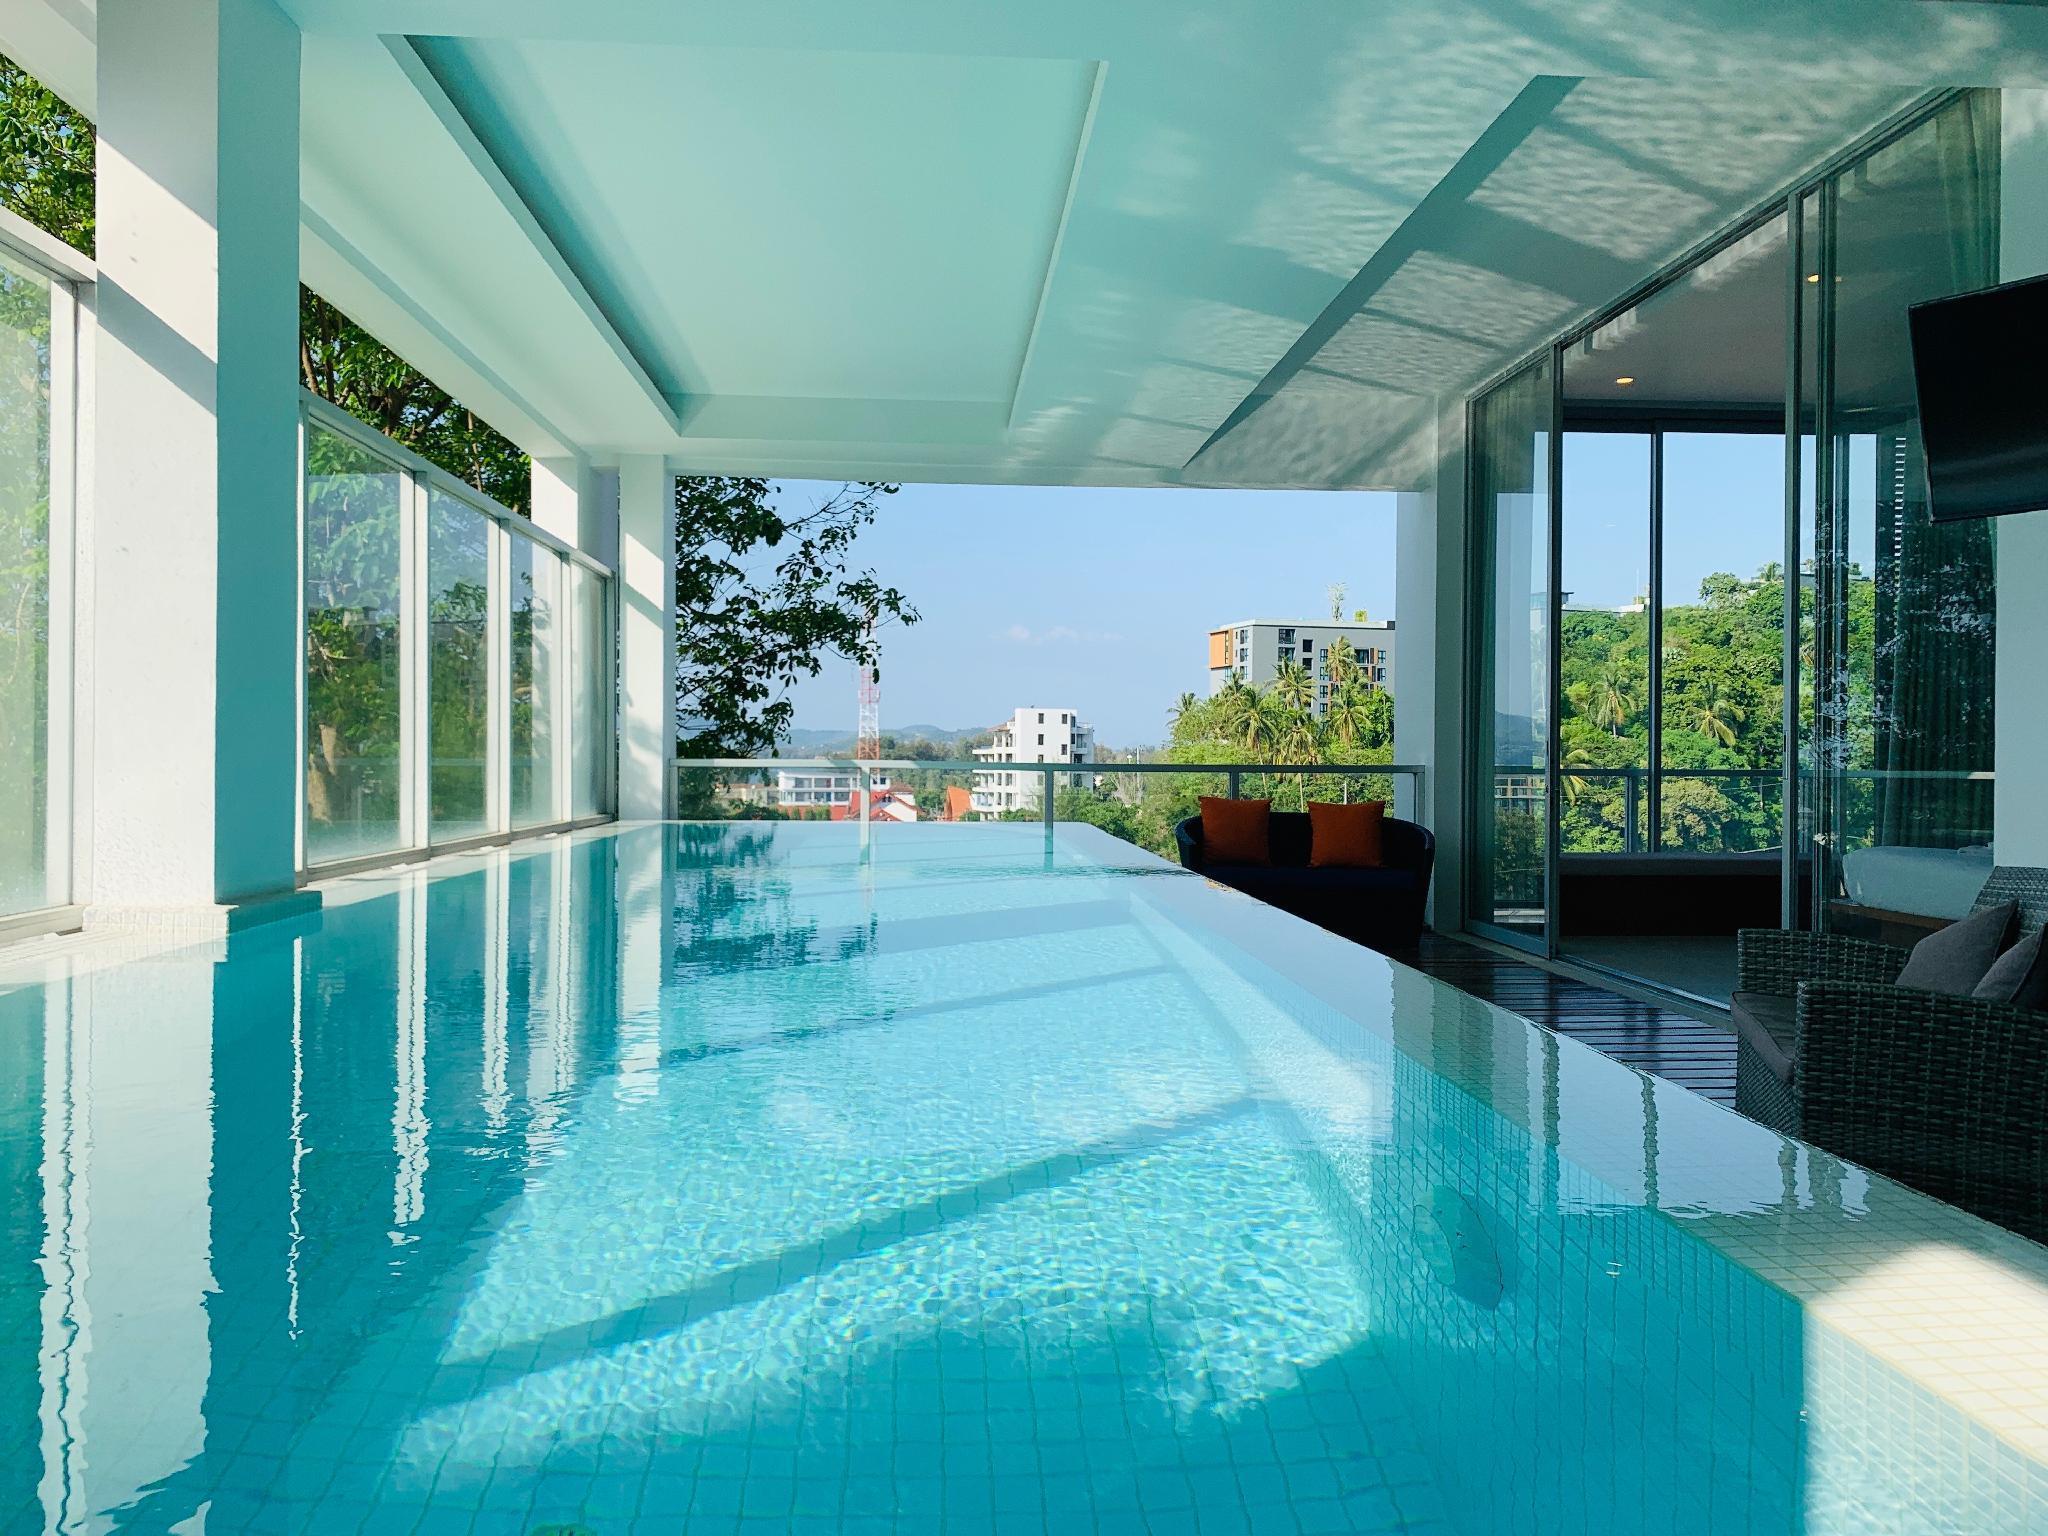 The Quarter 301 - Luxury Surin 3 BR, private pool The Quarter 301 - Luxury Surin 3 BR, private pool